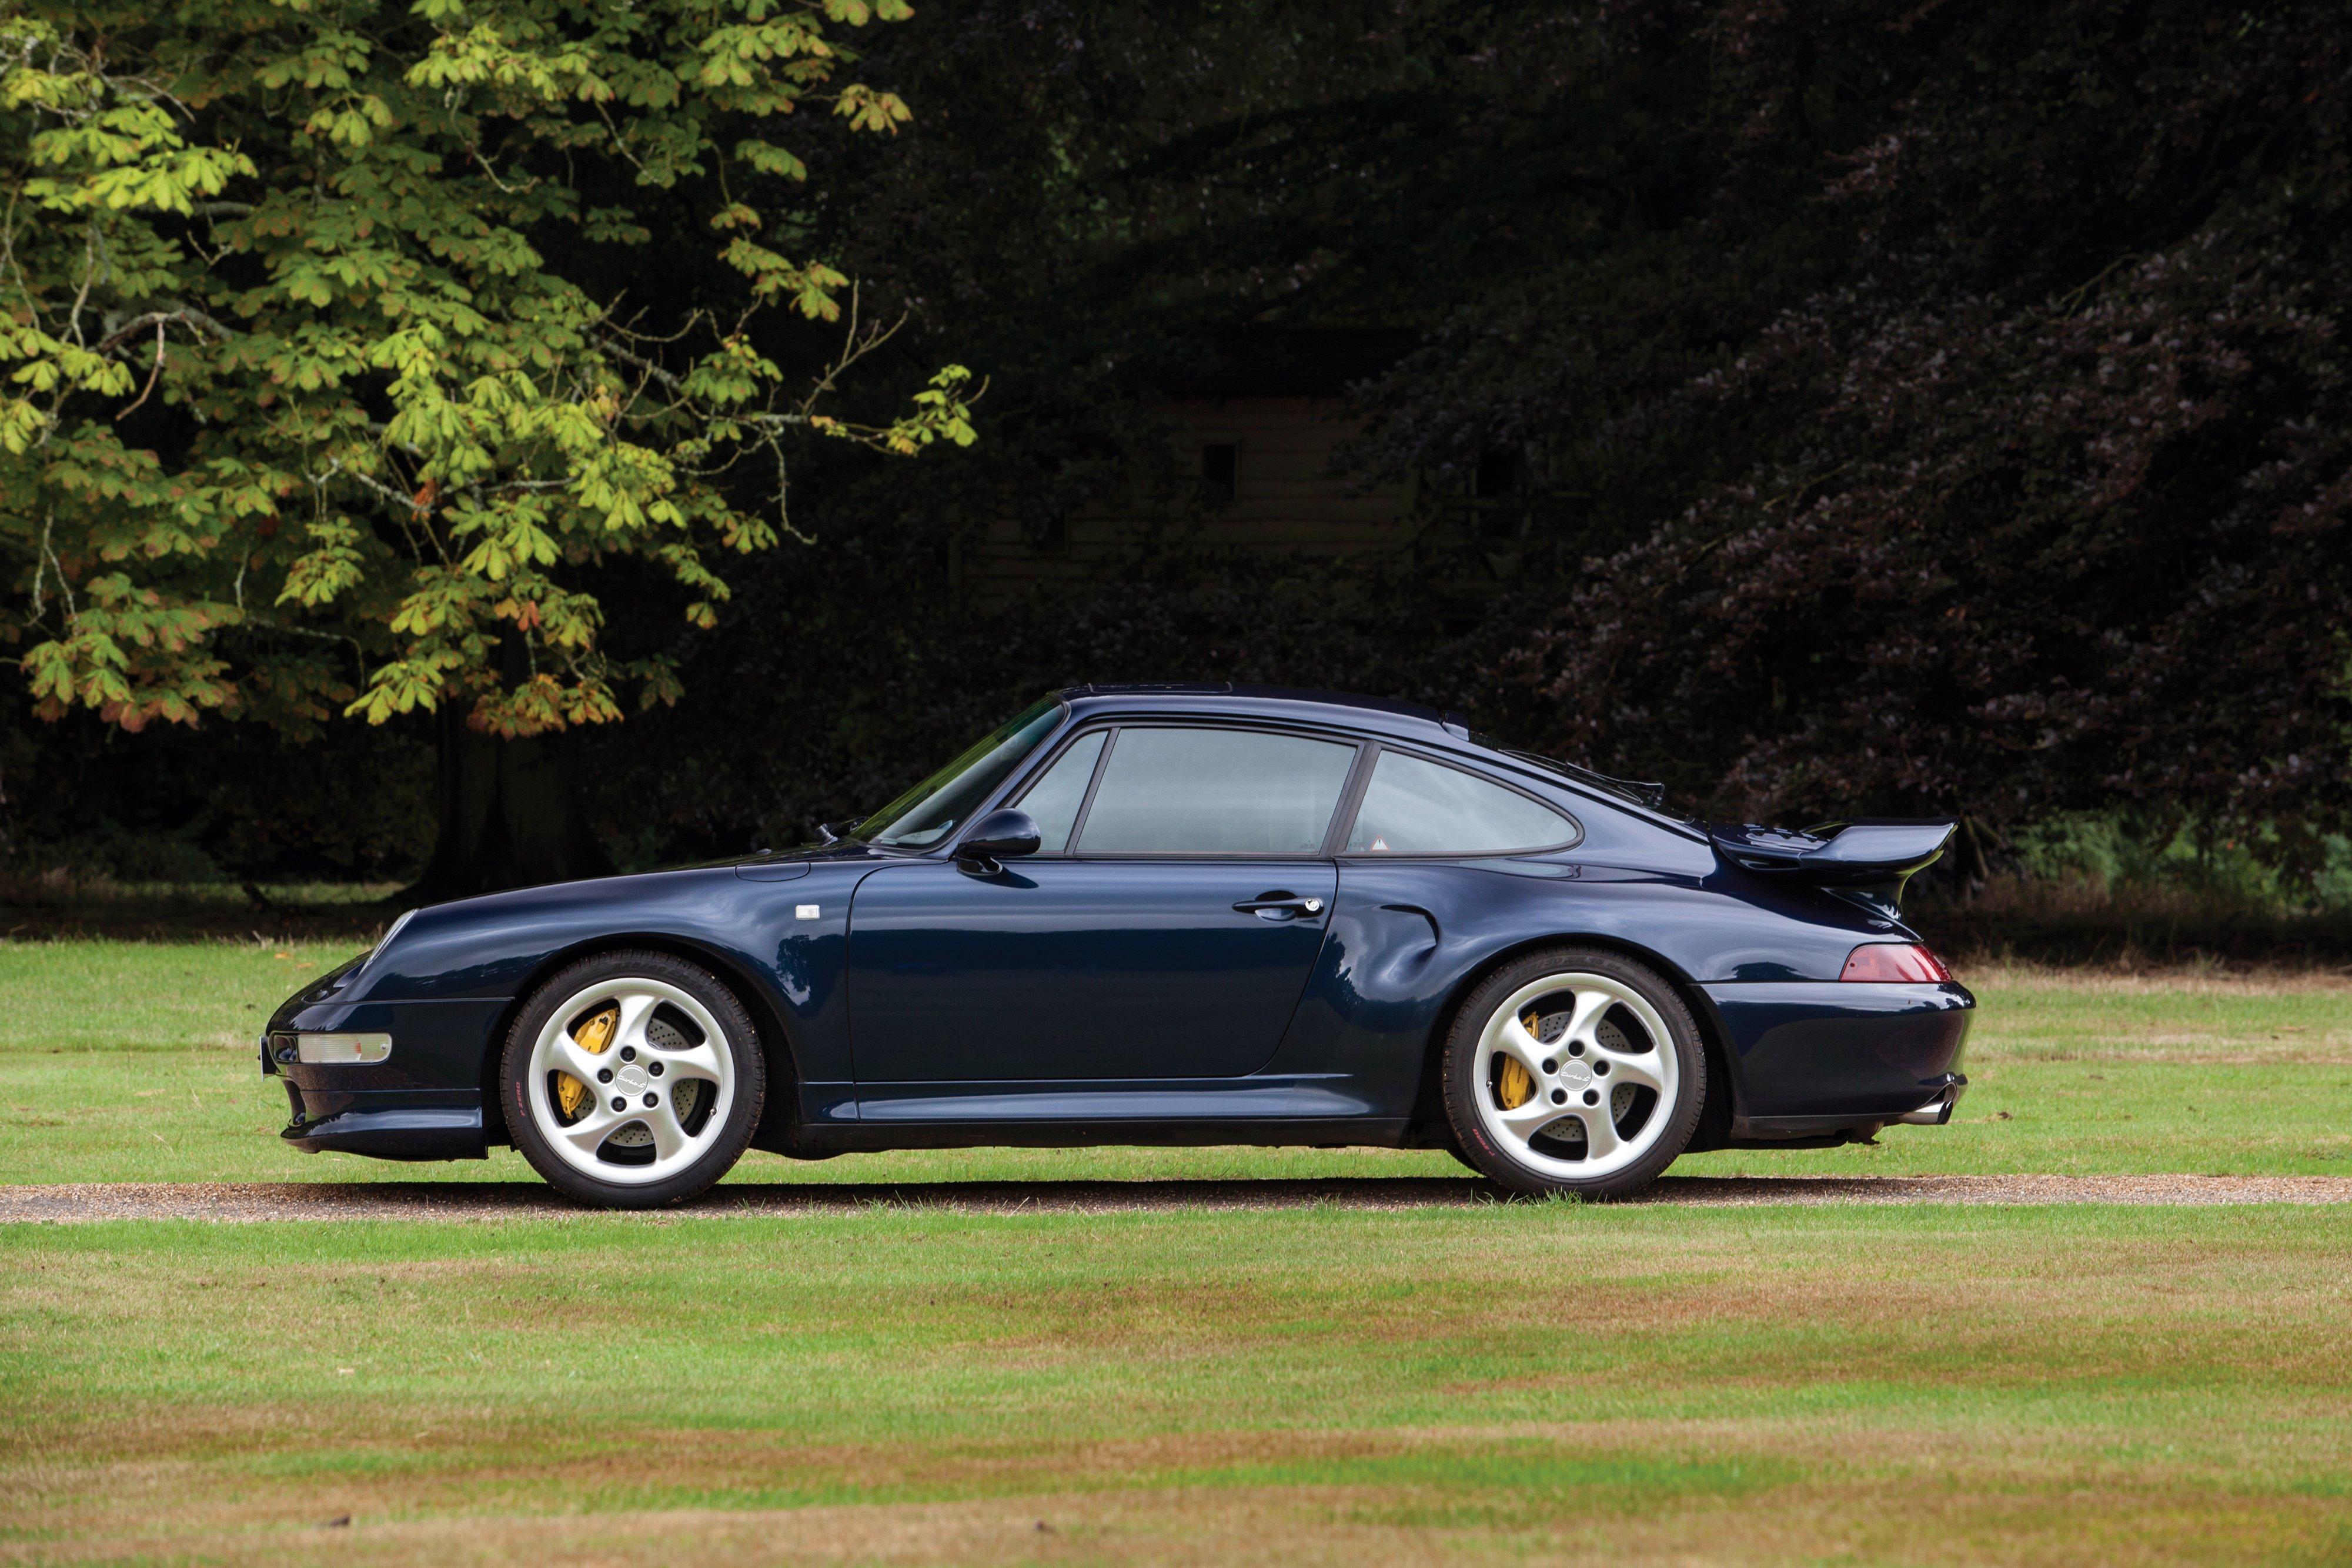 1998 Porsche 911 Turbo S 3 6 Coupe Uk Spec 993 Wallpaper 4000x2667 835402 Wallpaperup